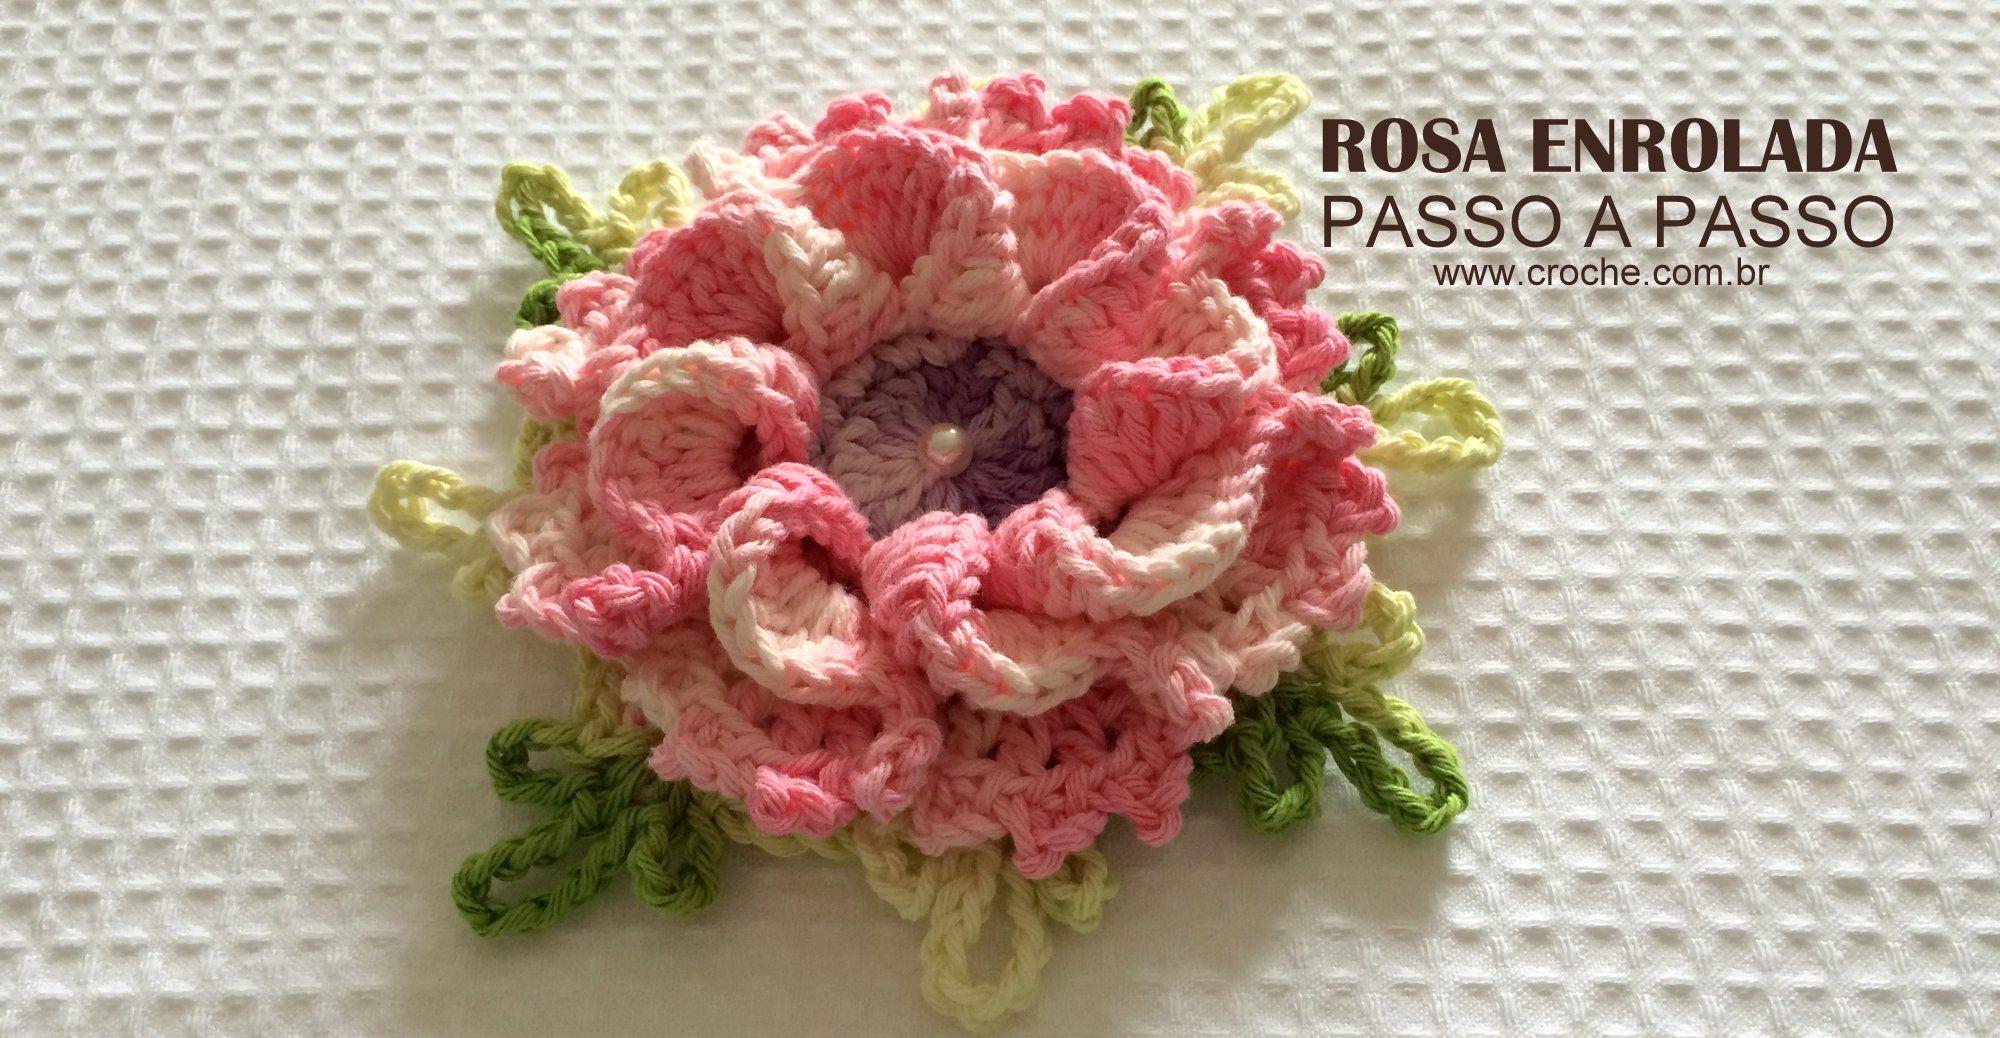 Rosa enrolada passo a passo   Pinterest